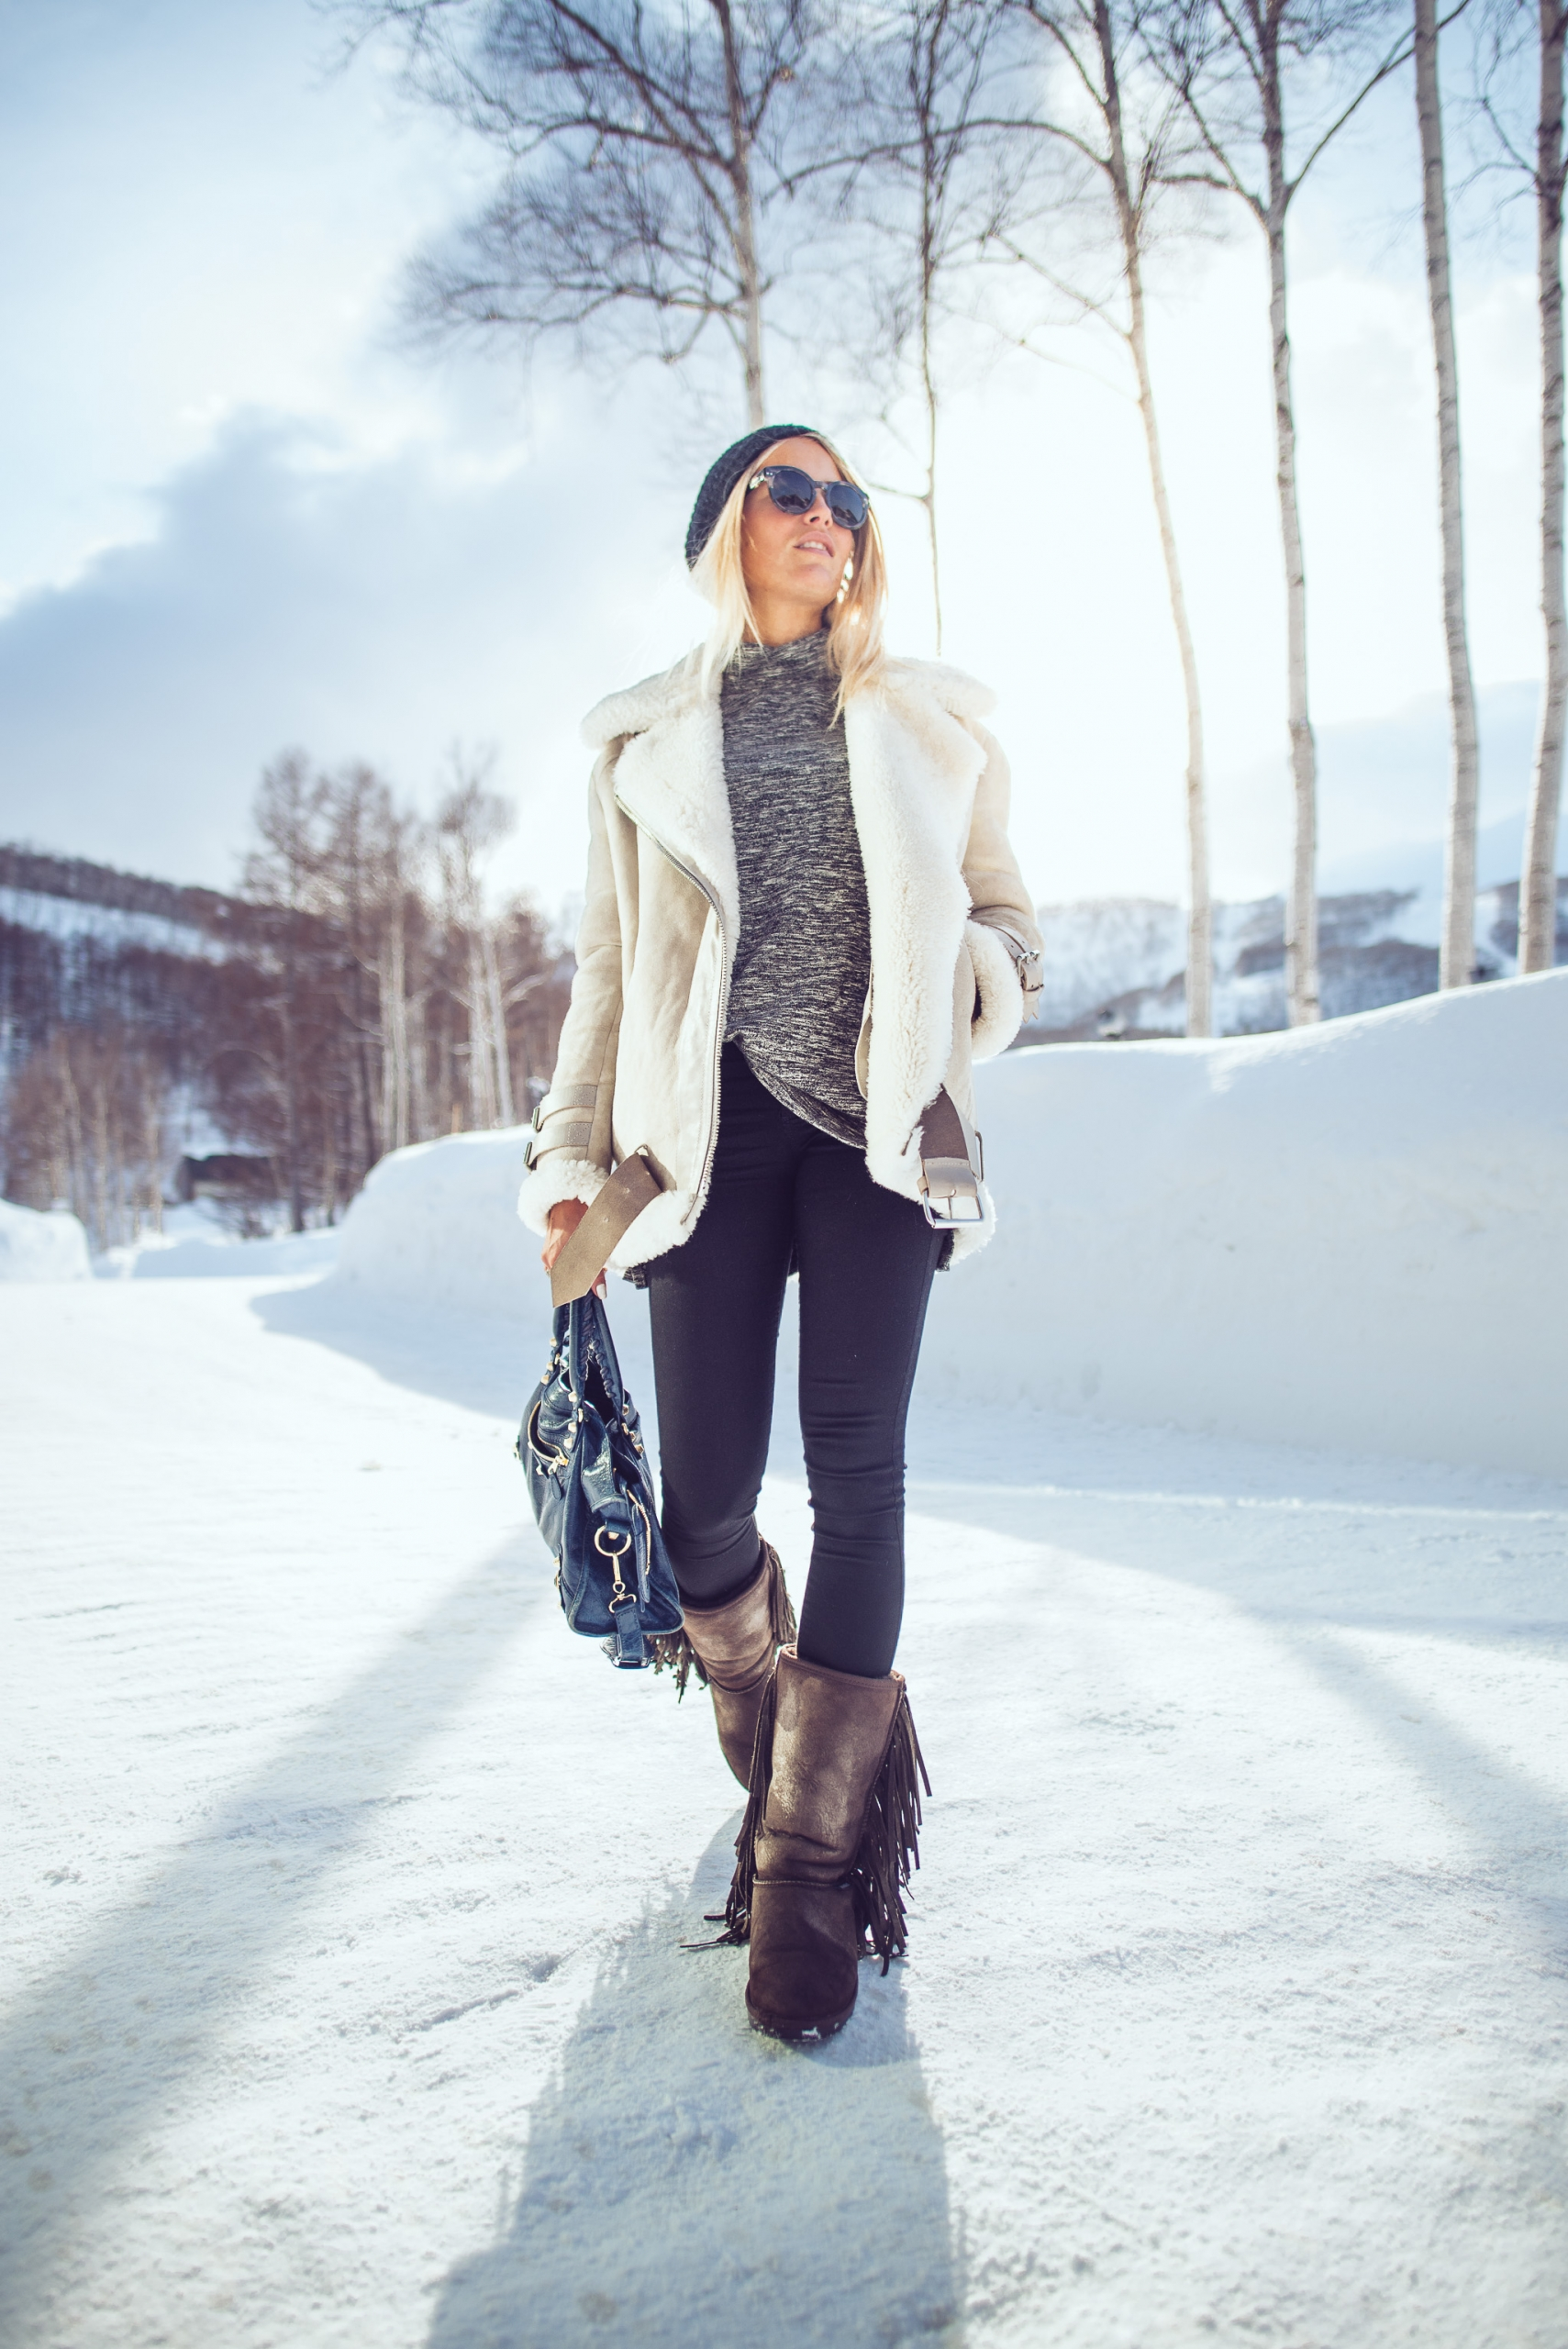 janni-deler-winter-outfitDSC_9657